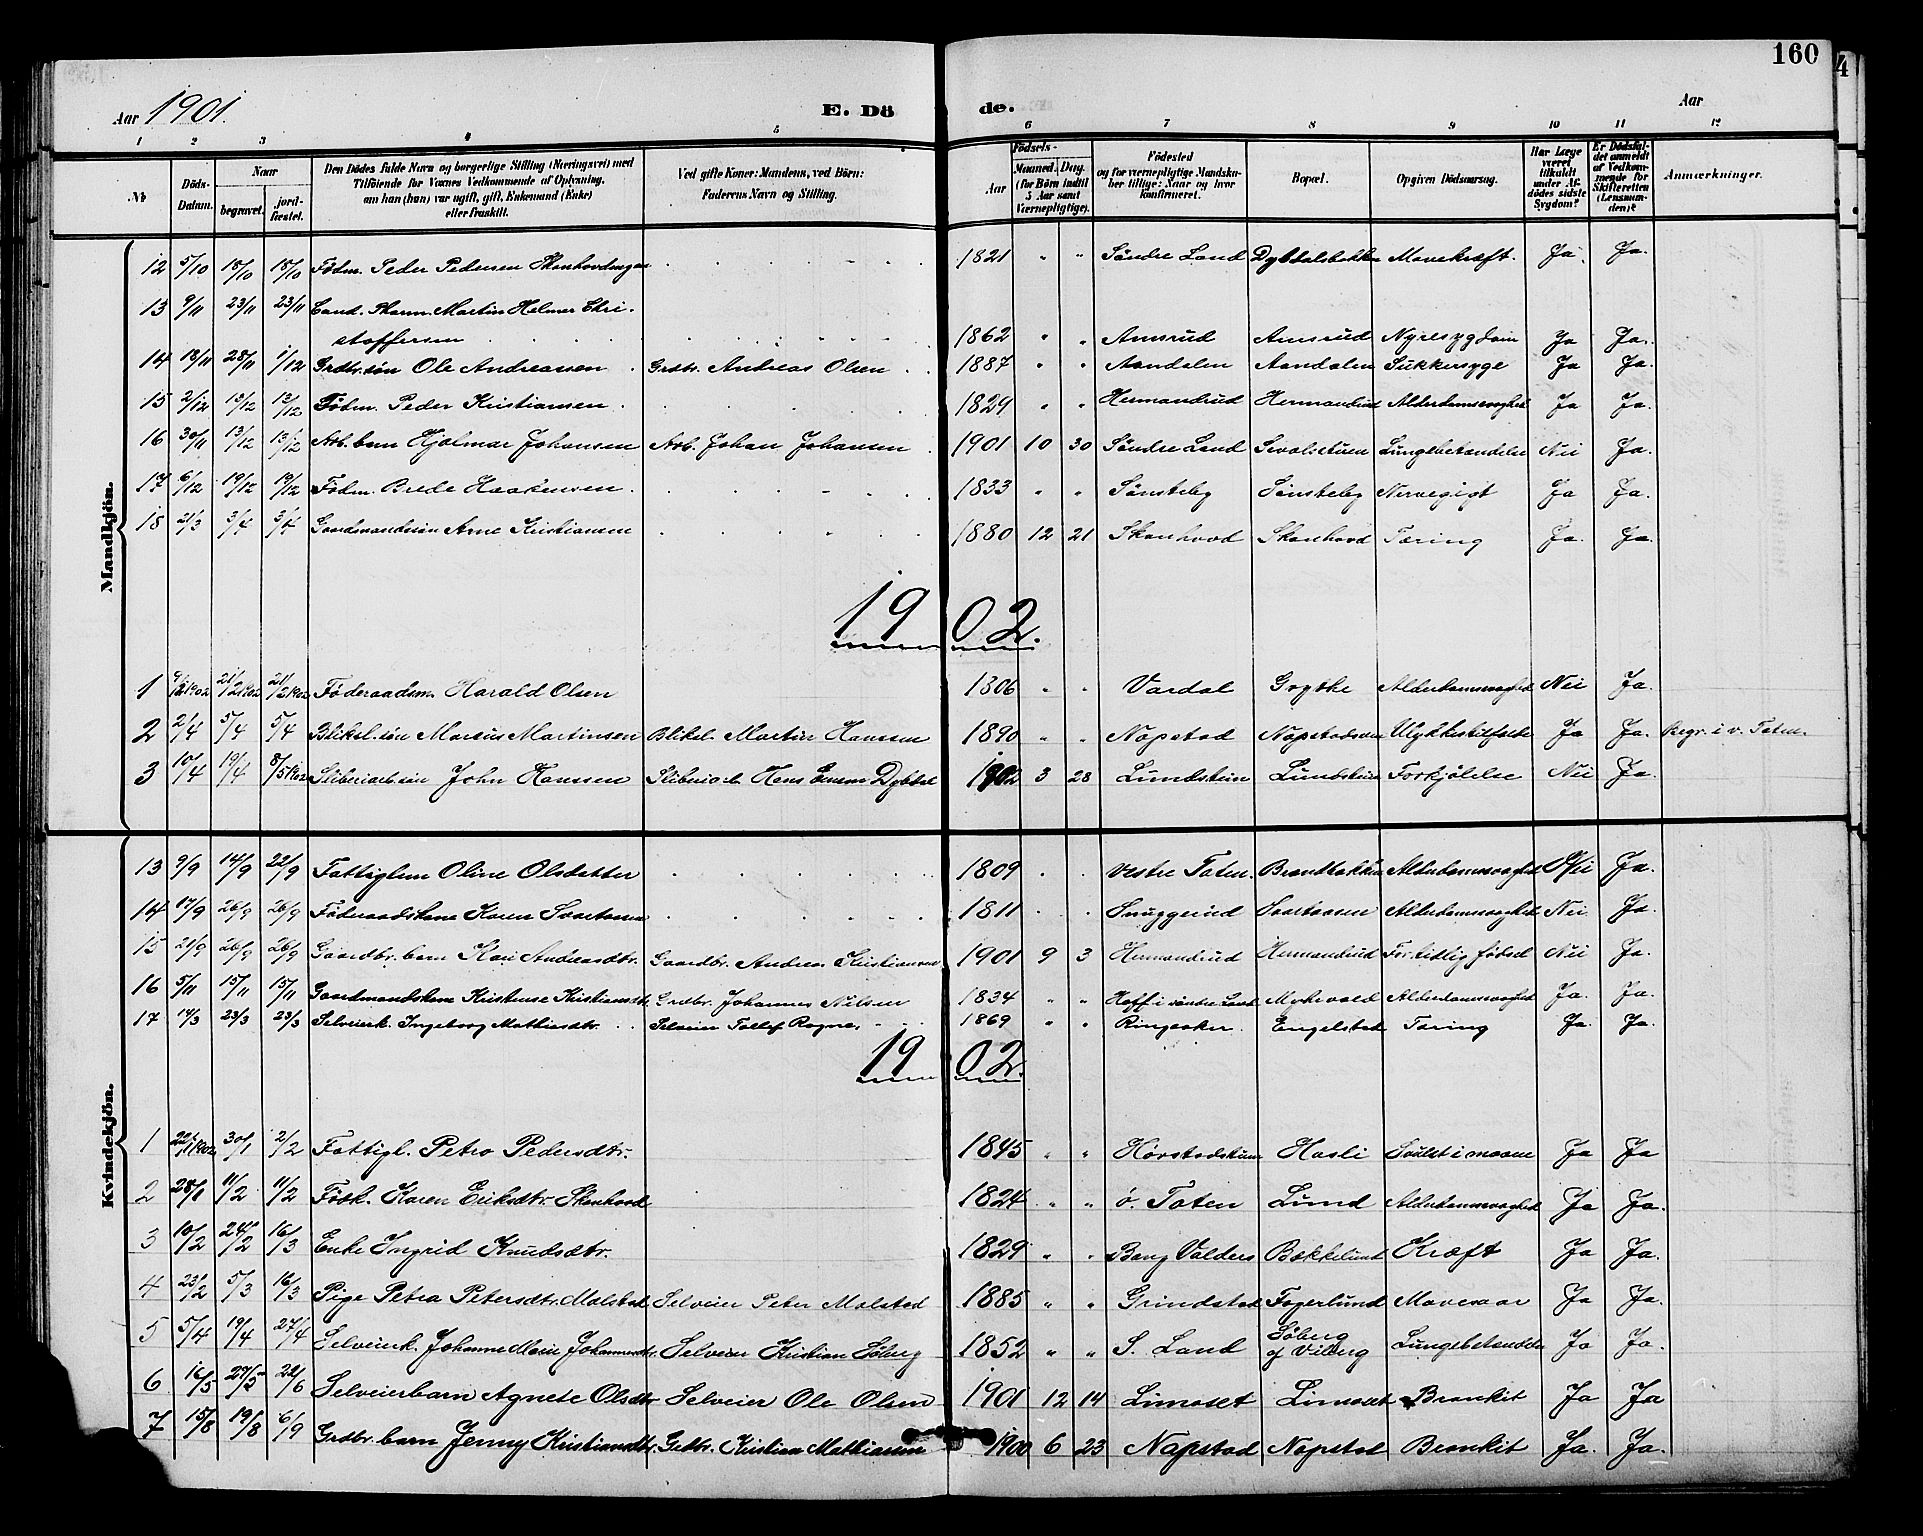 SAH, Vardal prestekontor, H/Ha/Hab/L0011: Klokkerbok nr. 11, 1899-1913, s. 160